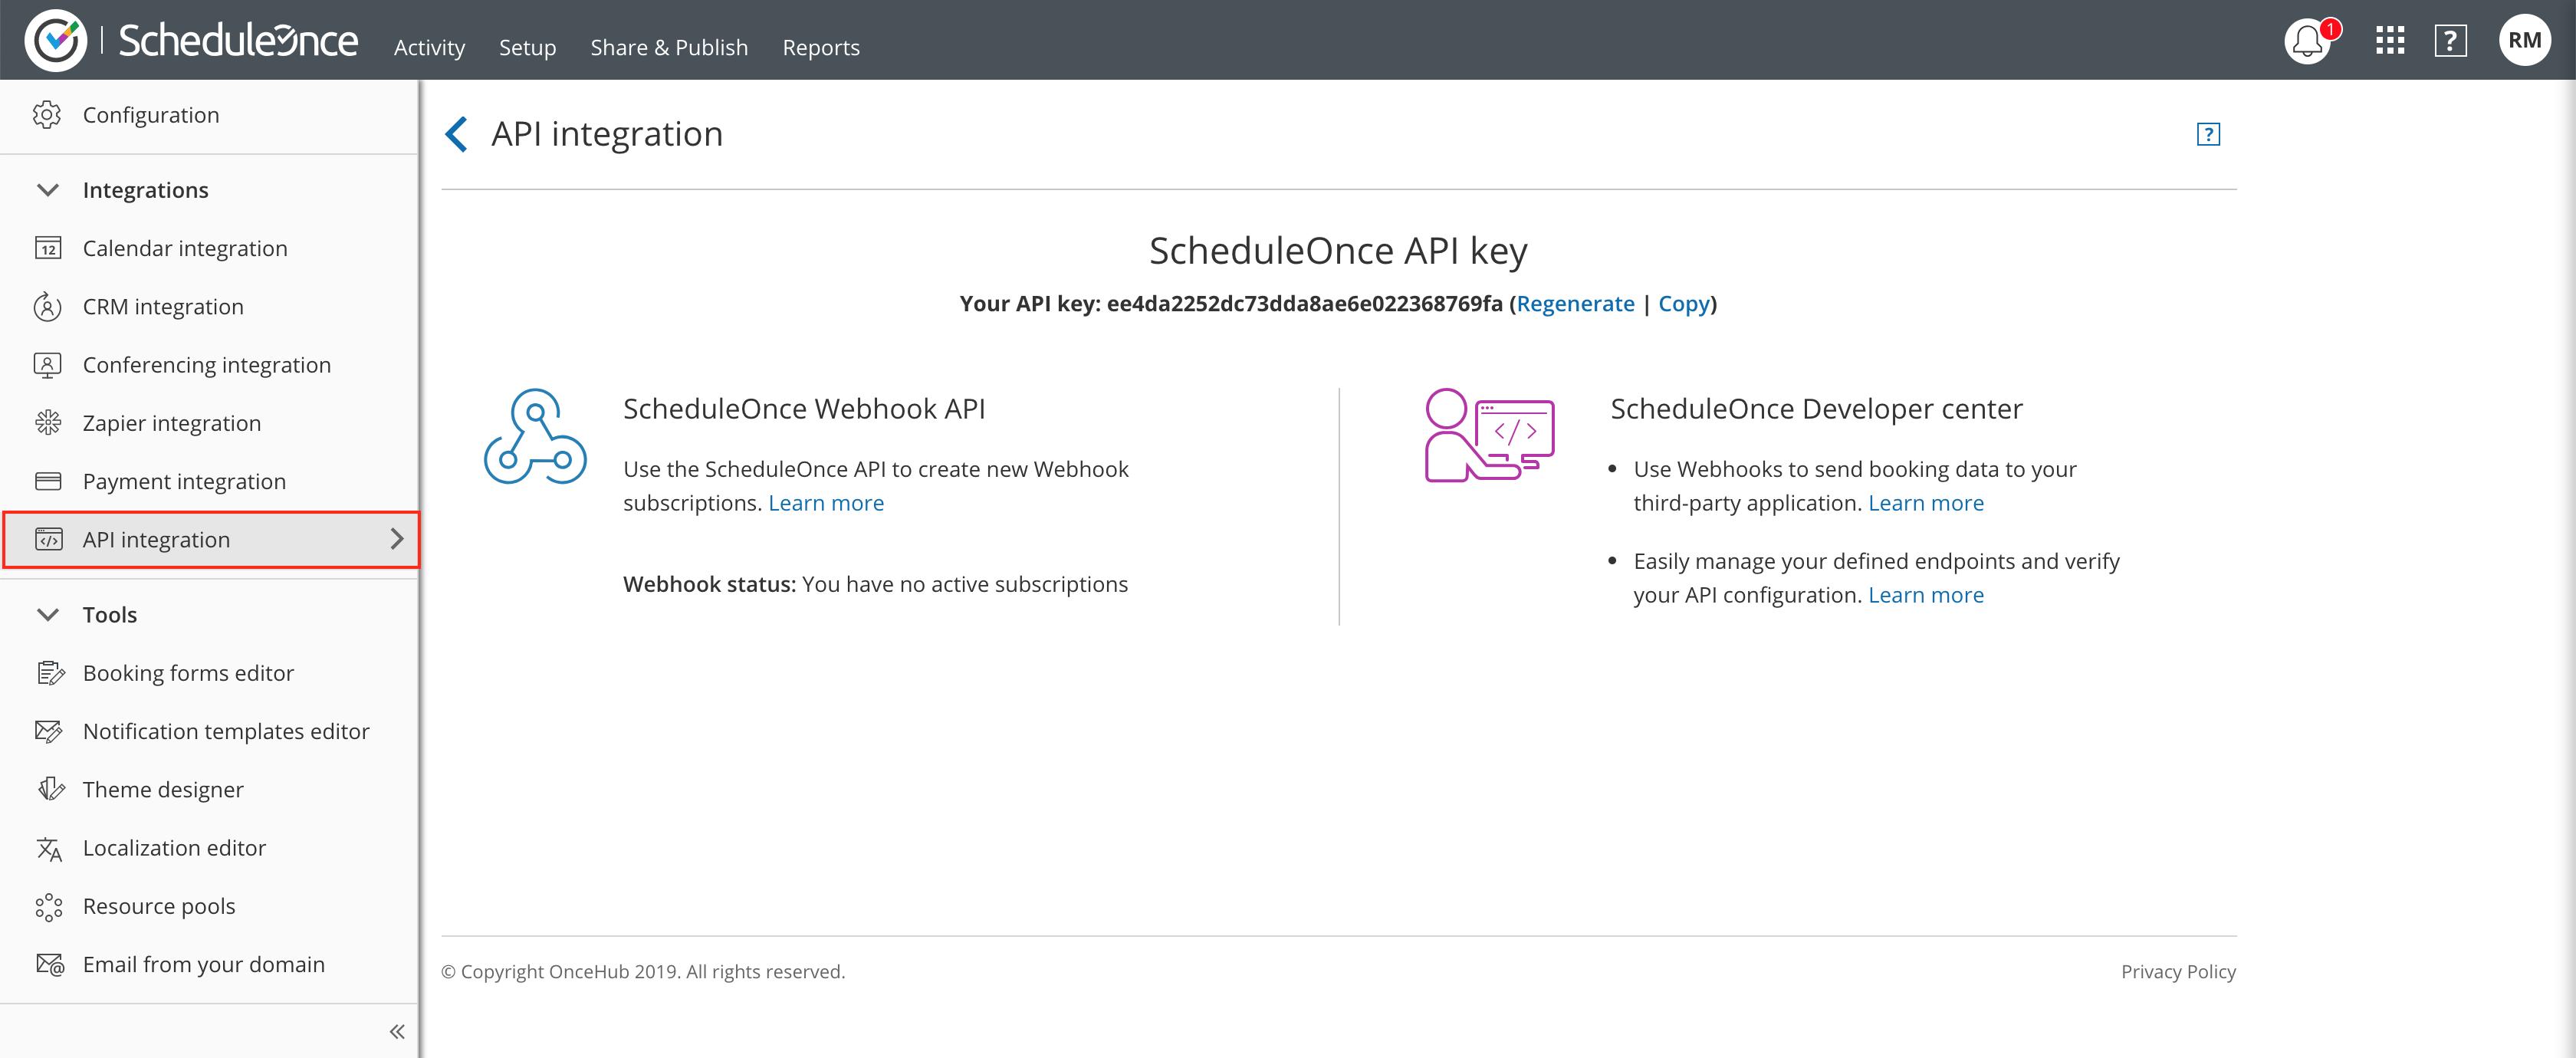 Figure 1: API Integration page with navigation menu